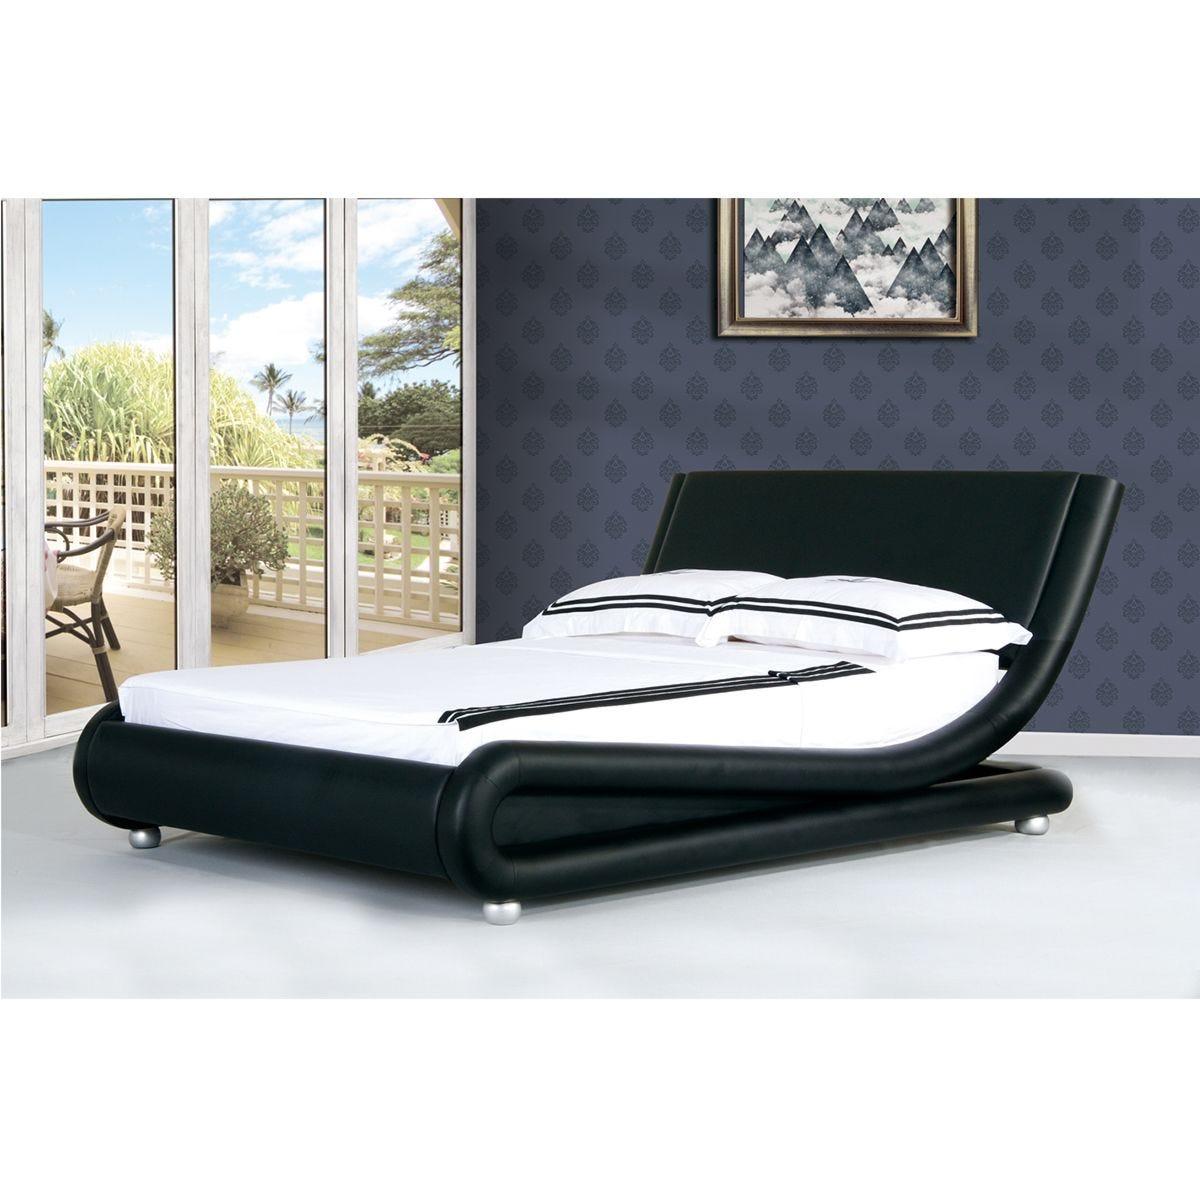 Jaxon Bed Frame - Black